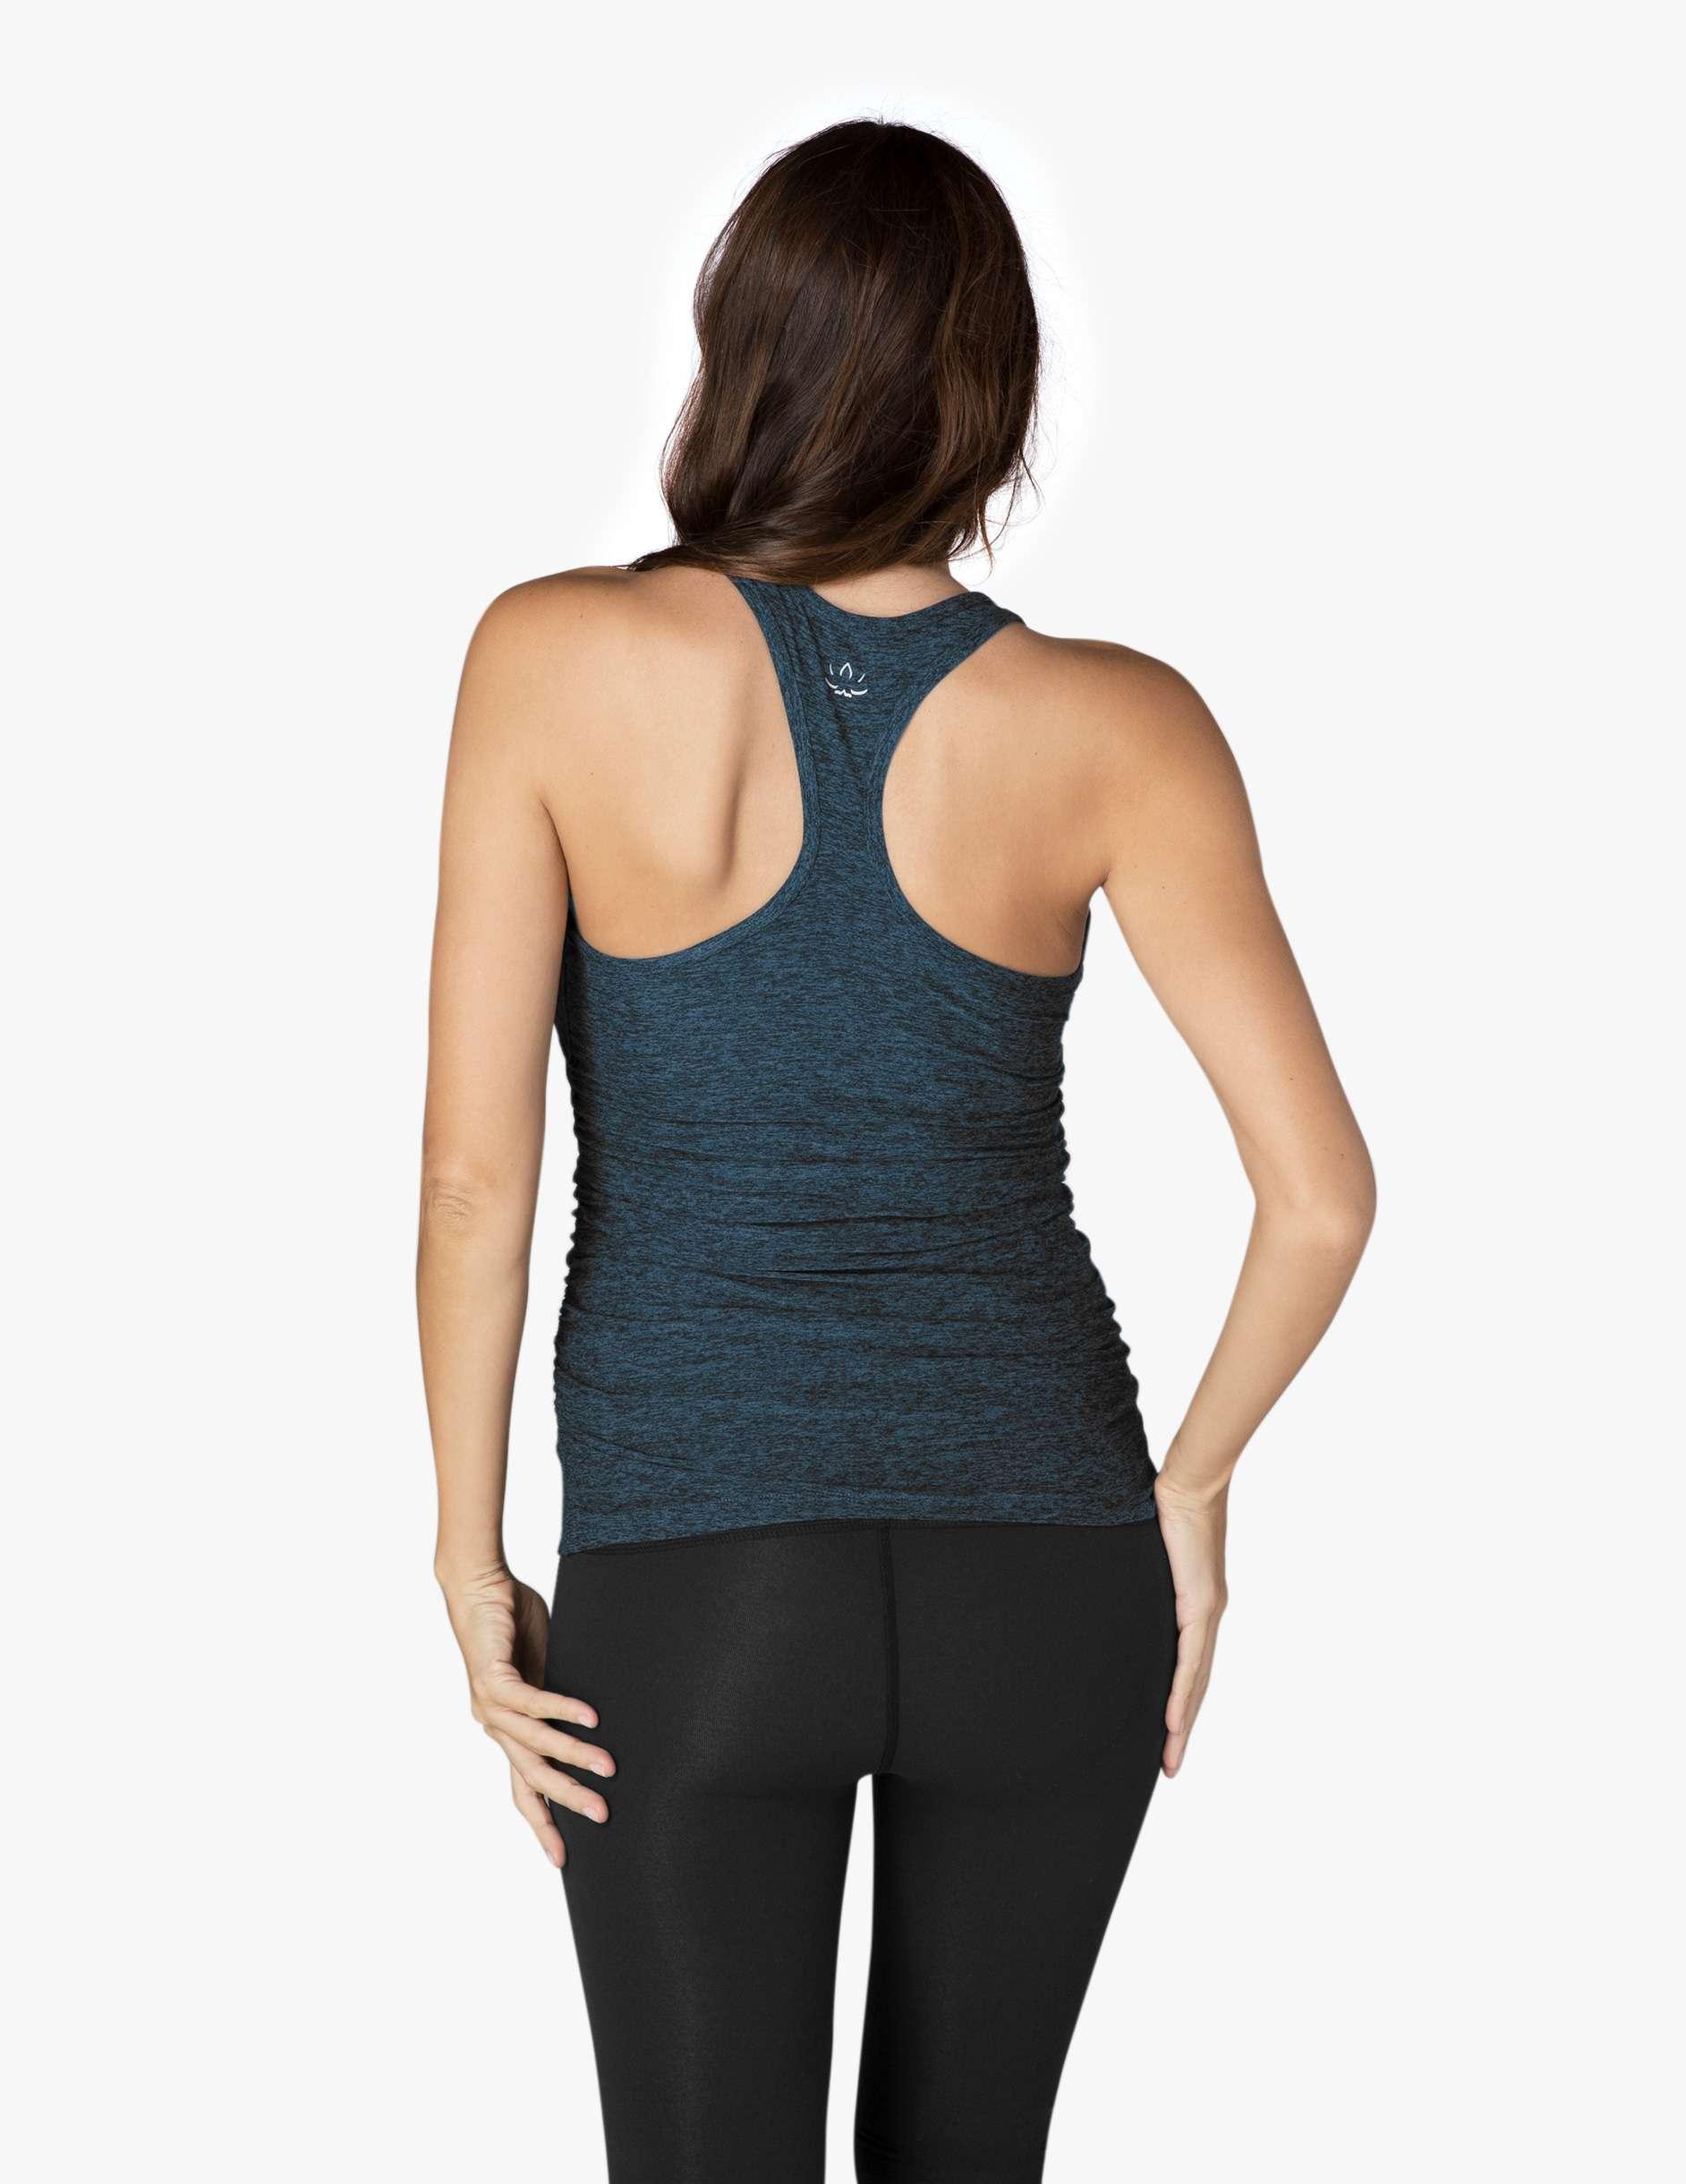 Beyoond Yog Maternity Yoga lightweight Vest top black deep sapphire blue